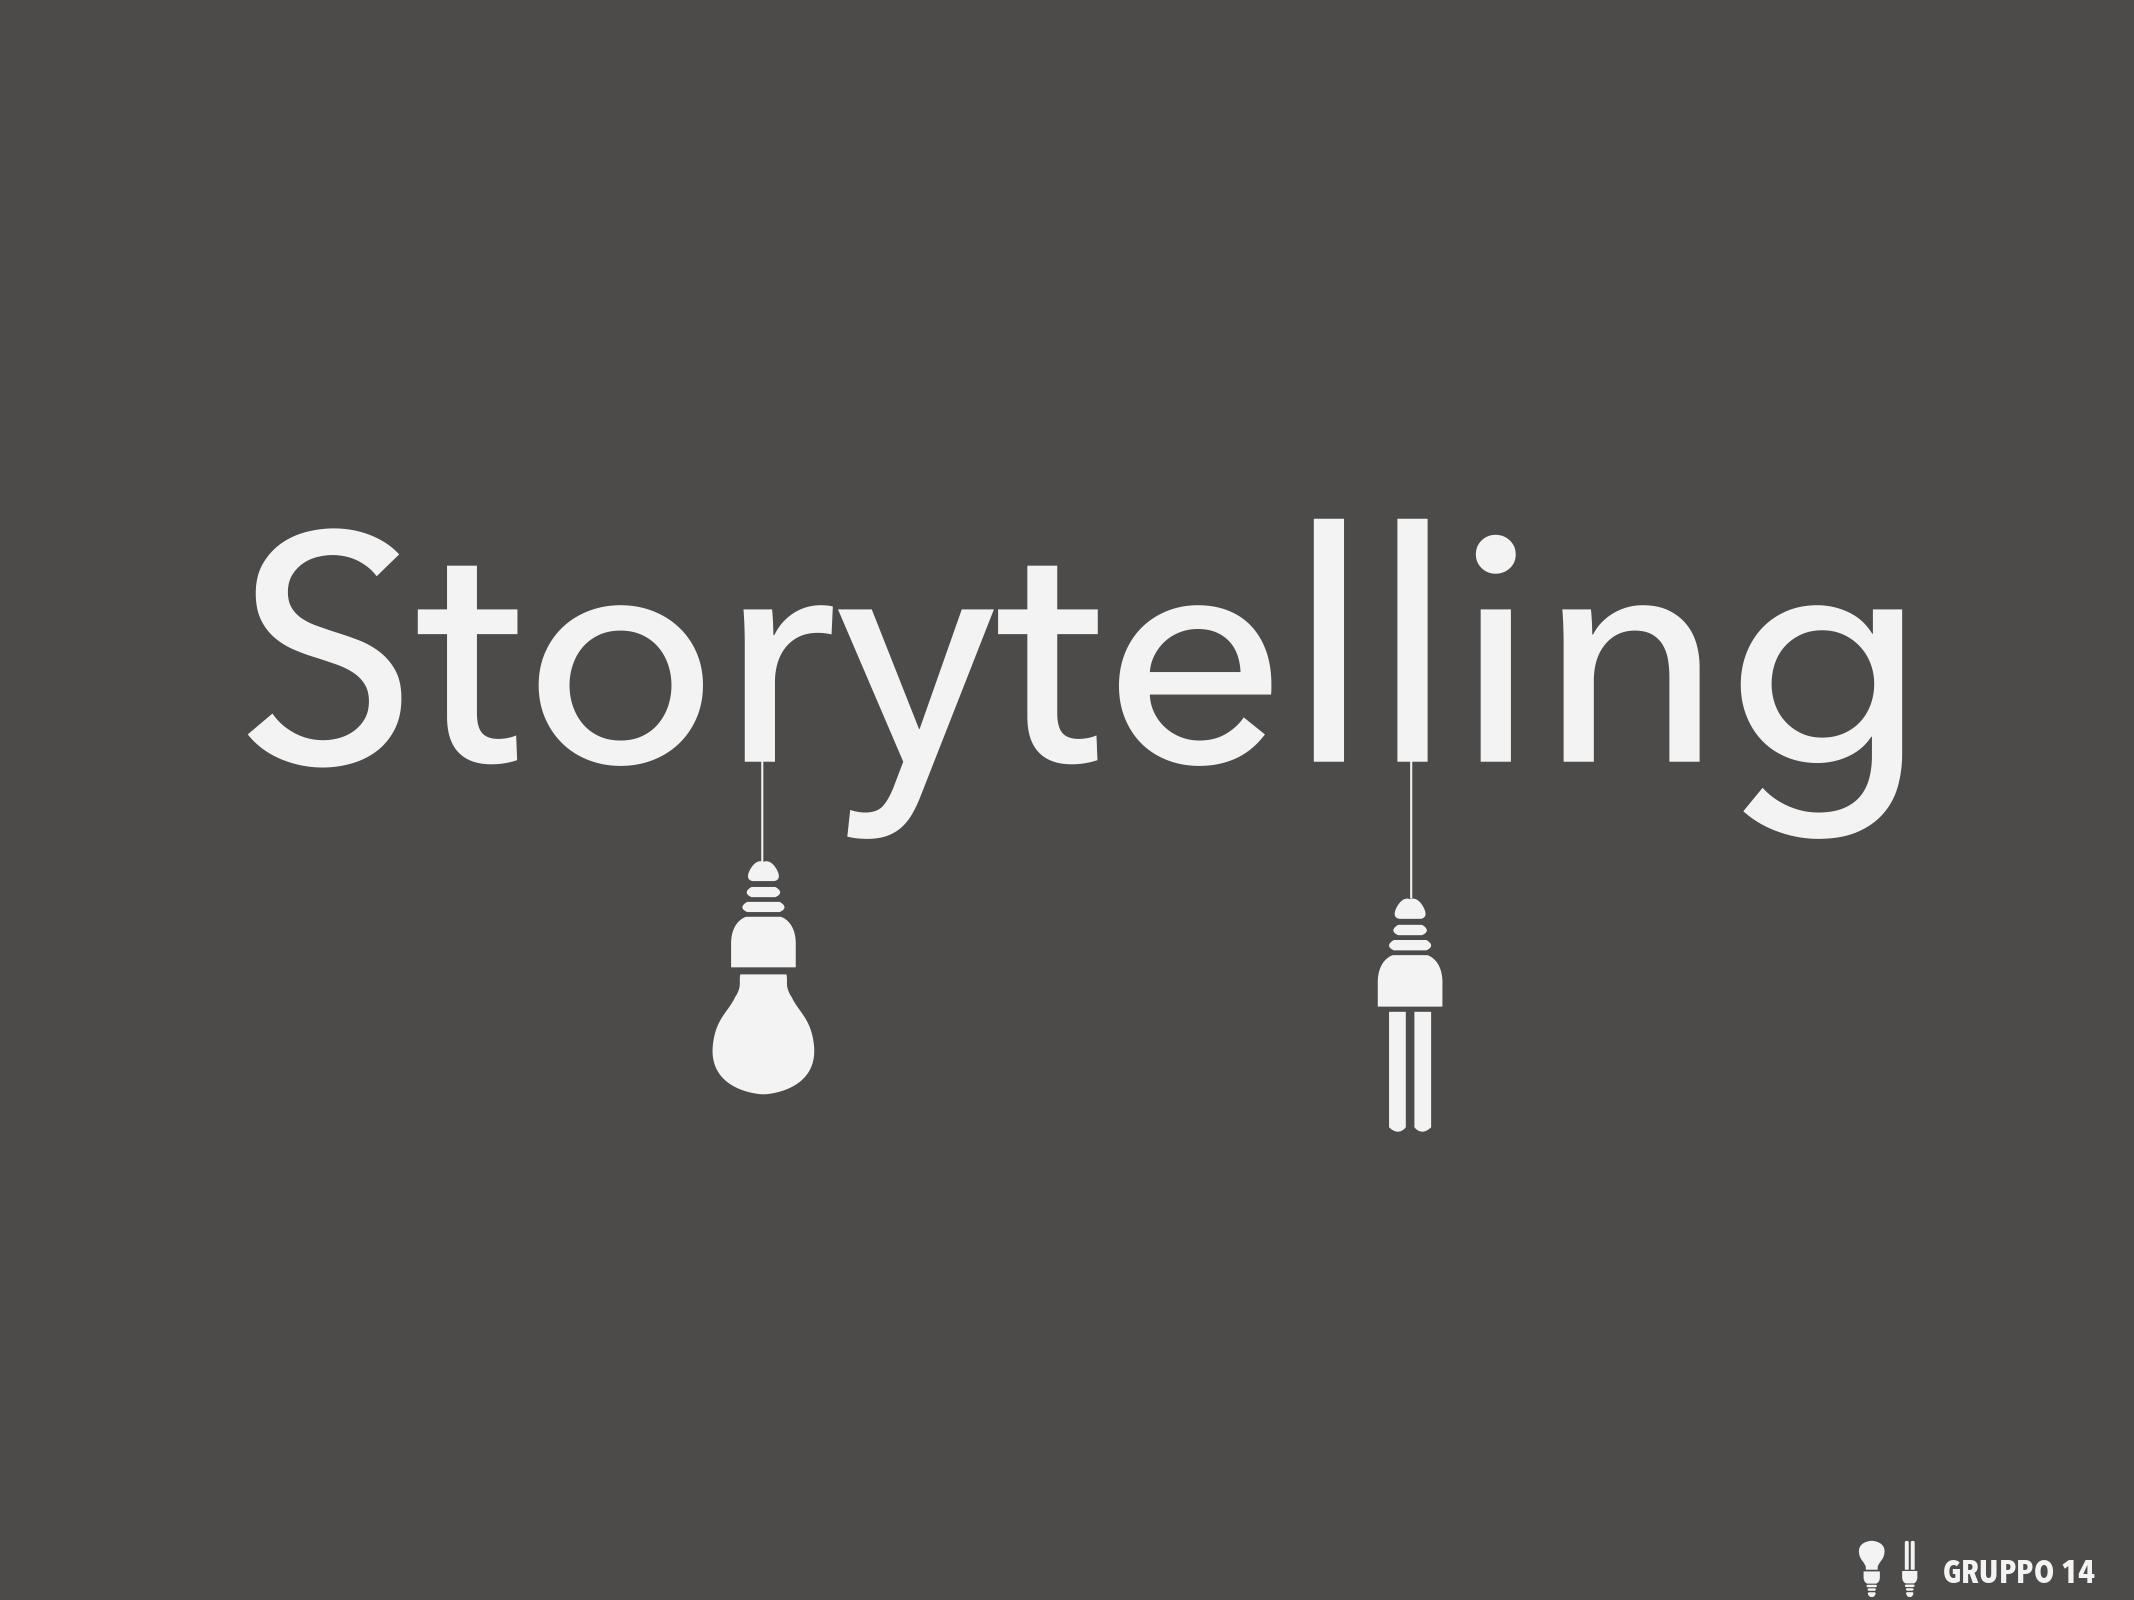 Hinckley Le idee non dormono mai 2016 Storytelling 01